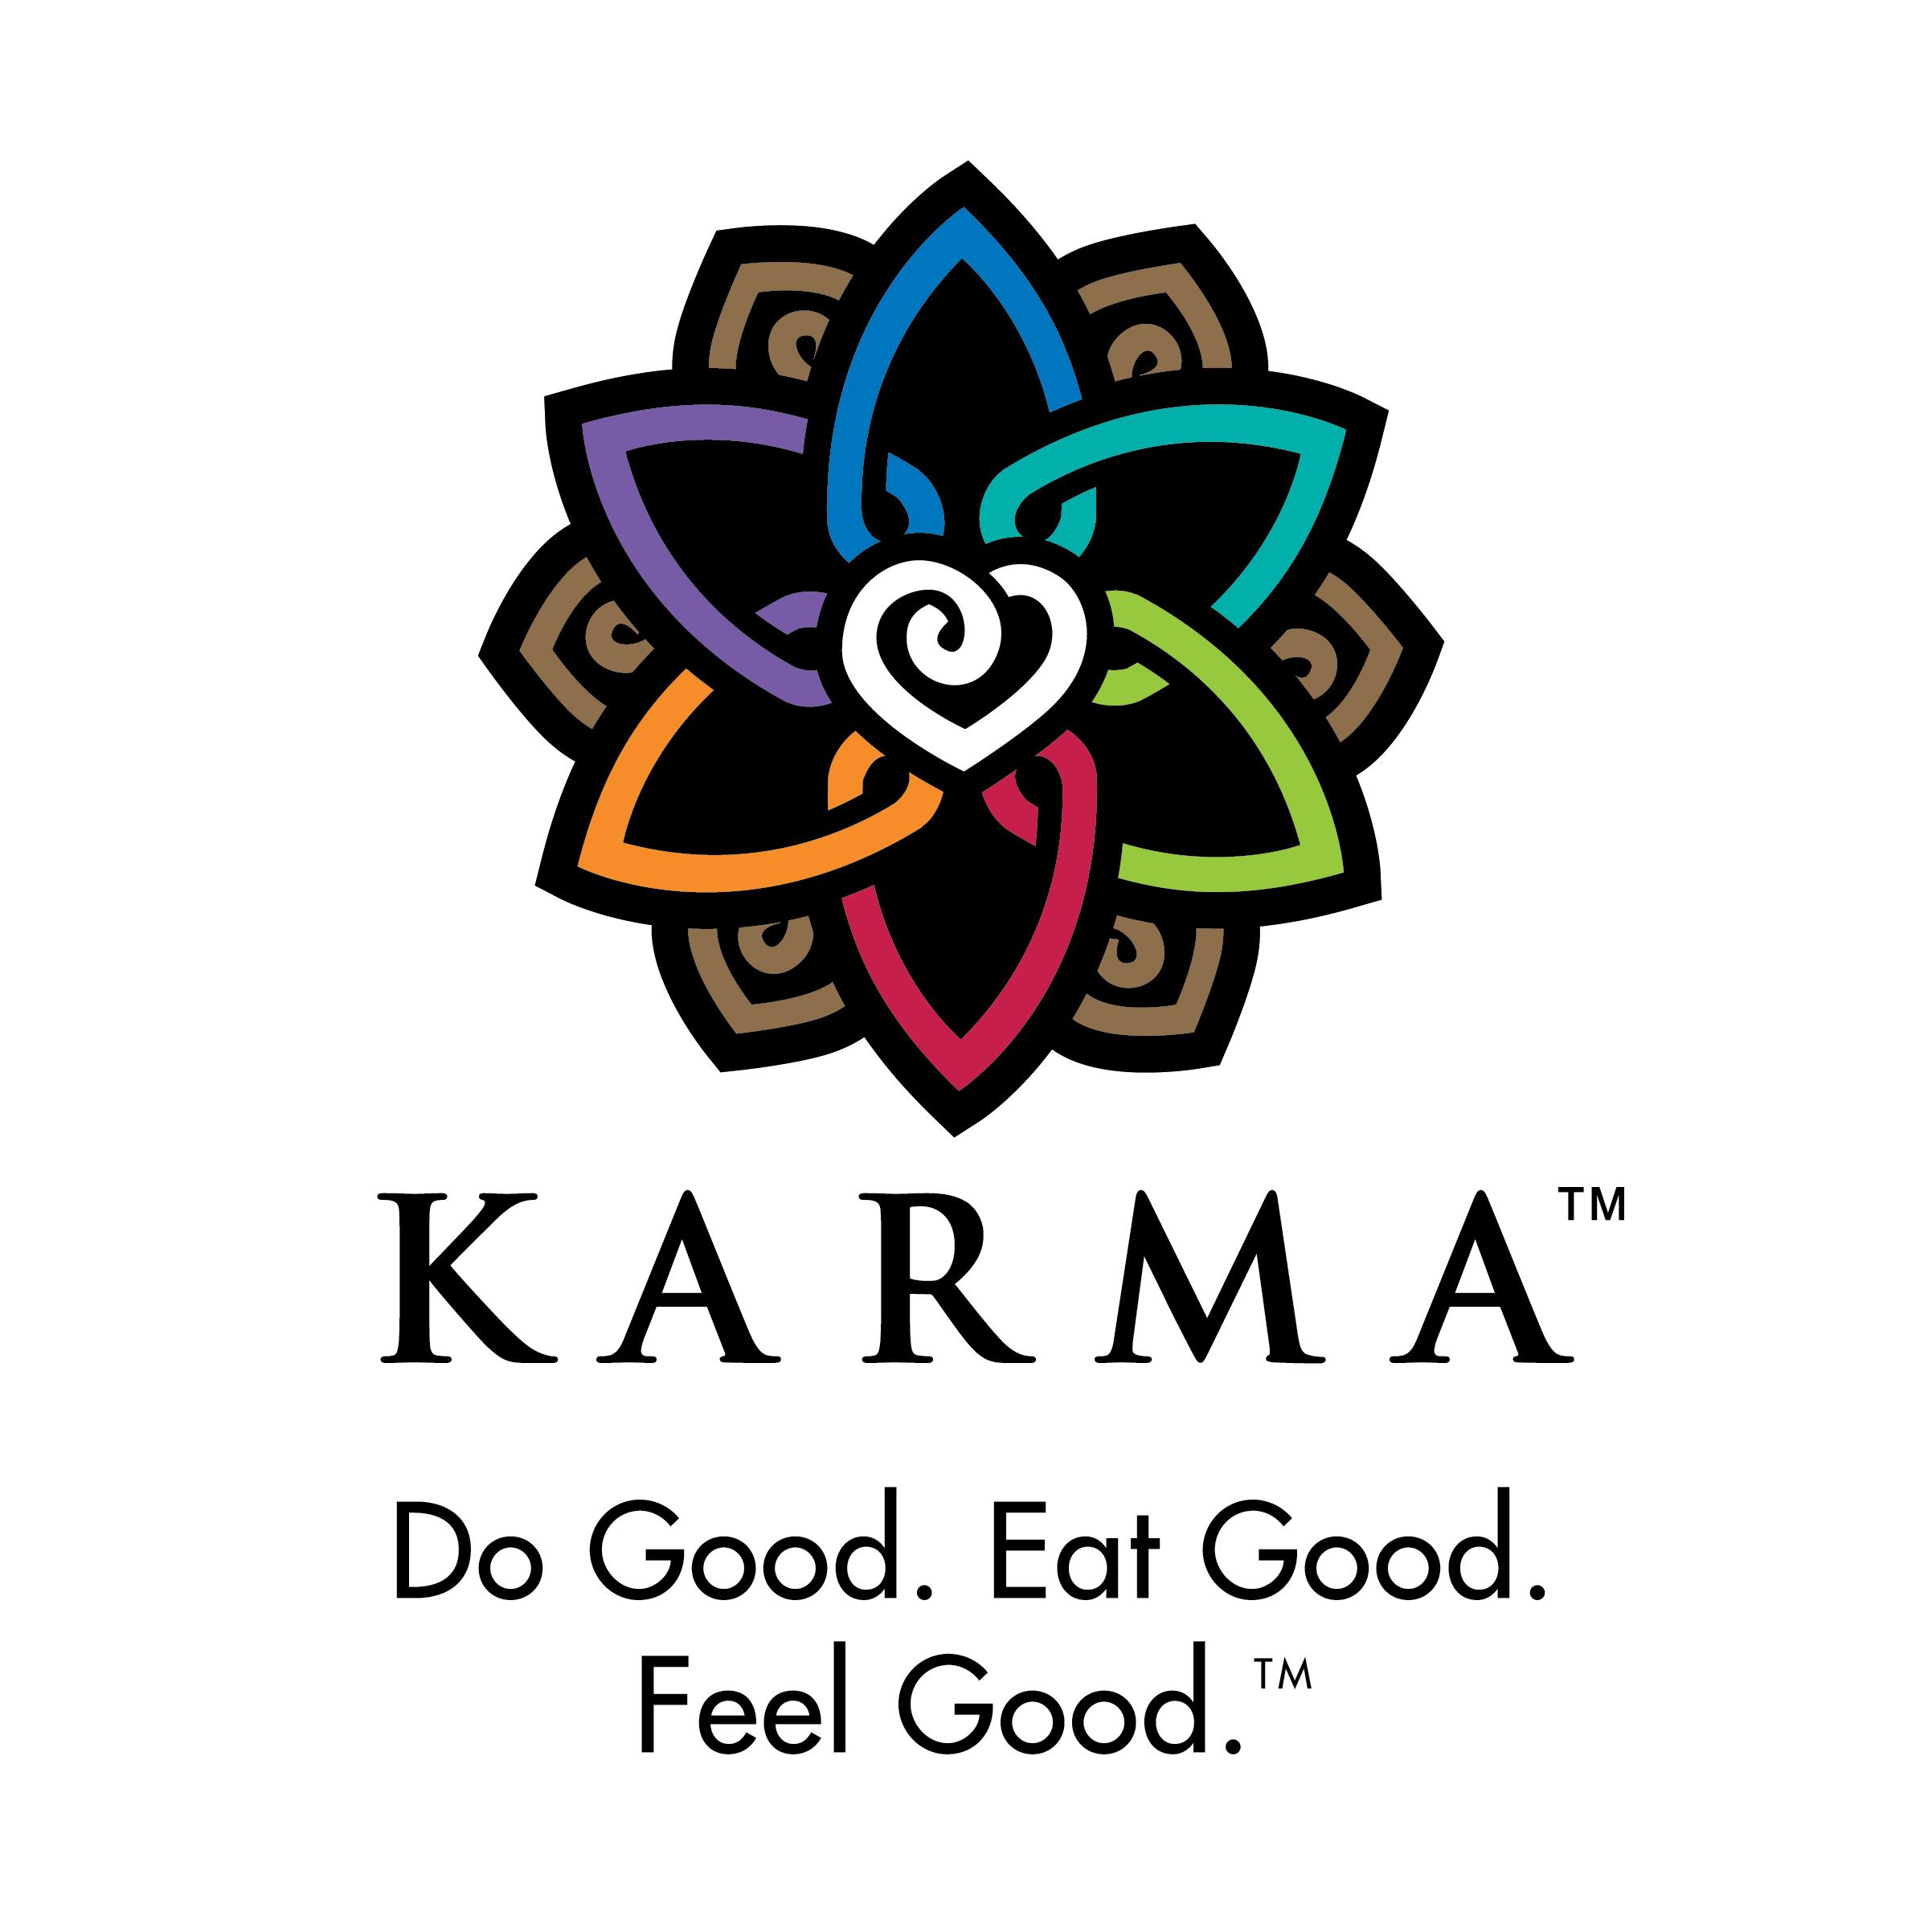 Karma__Tag_Positive(7)